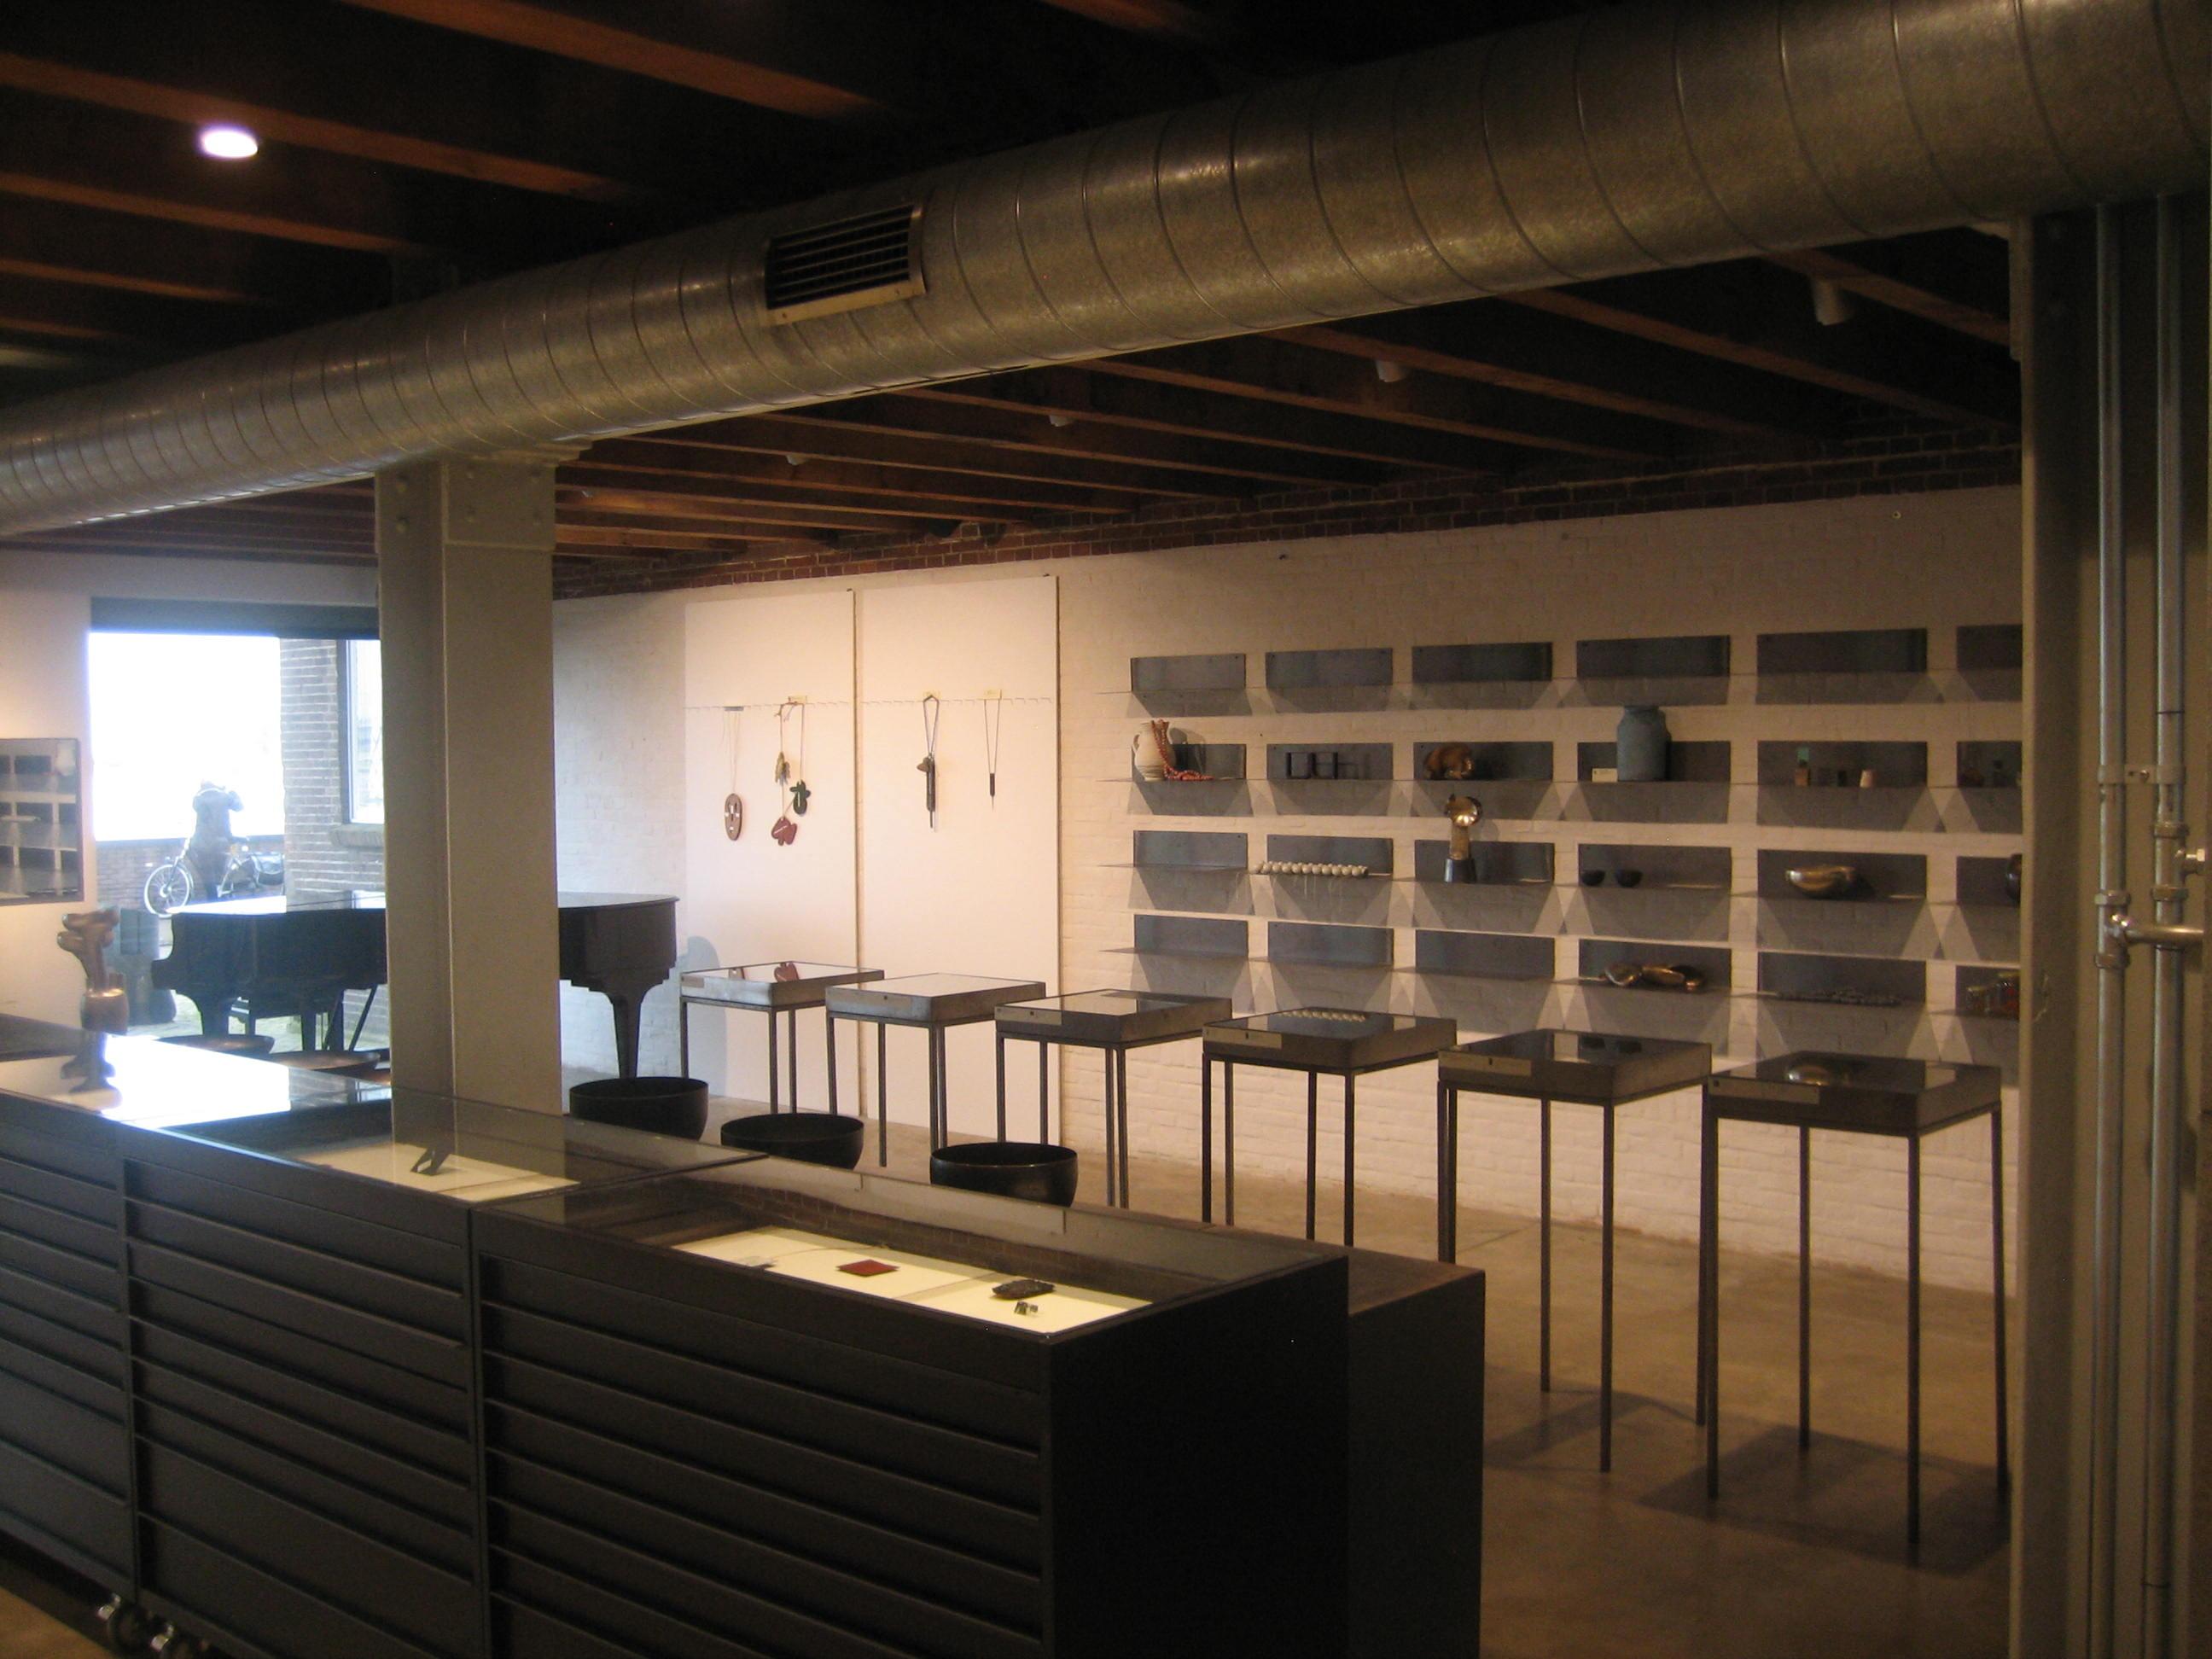 Galerie Marzee, januari 2018. Foto Esther Doornbusch, CC BY 4.0